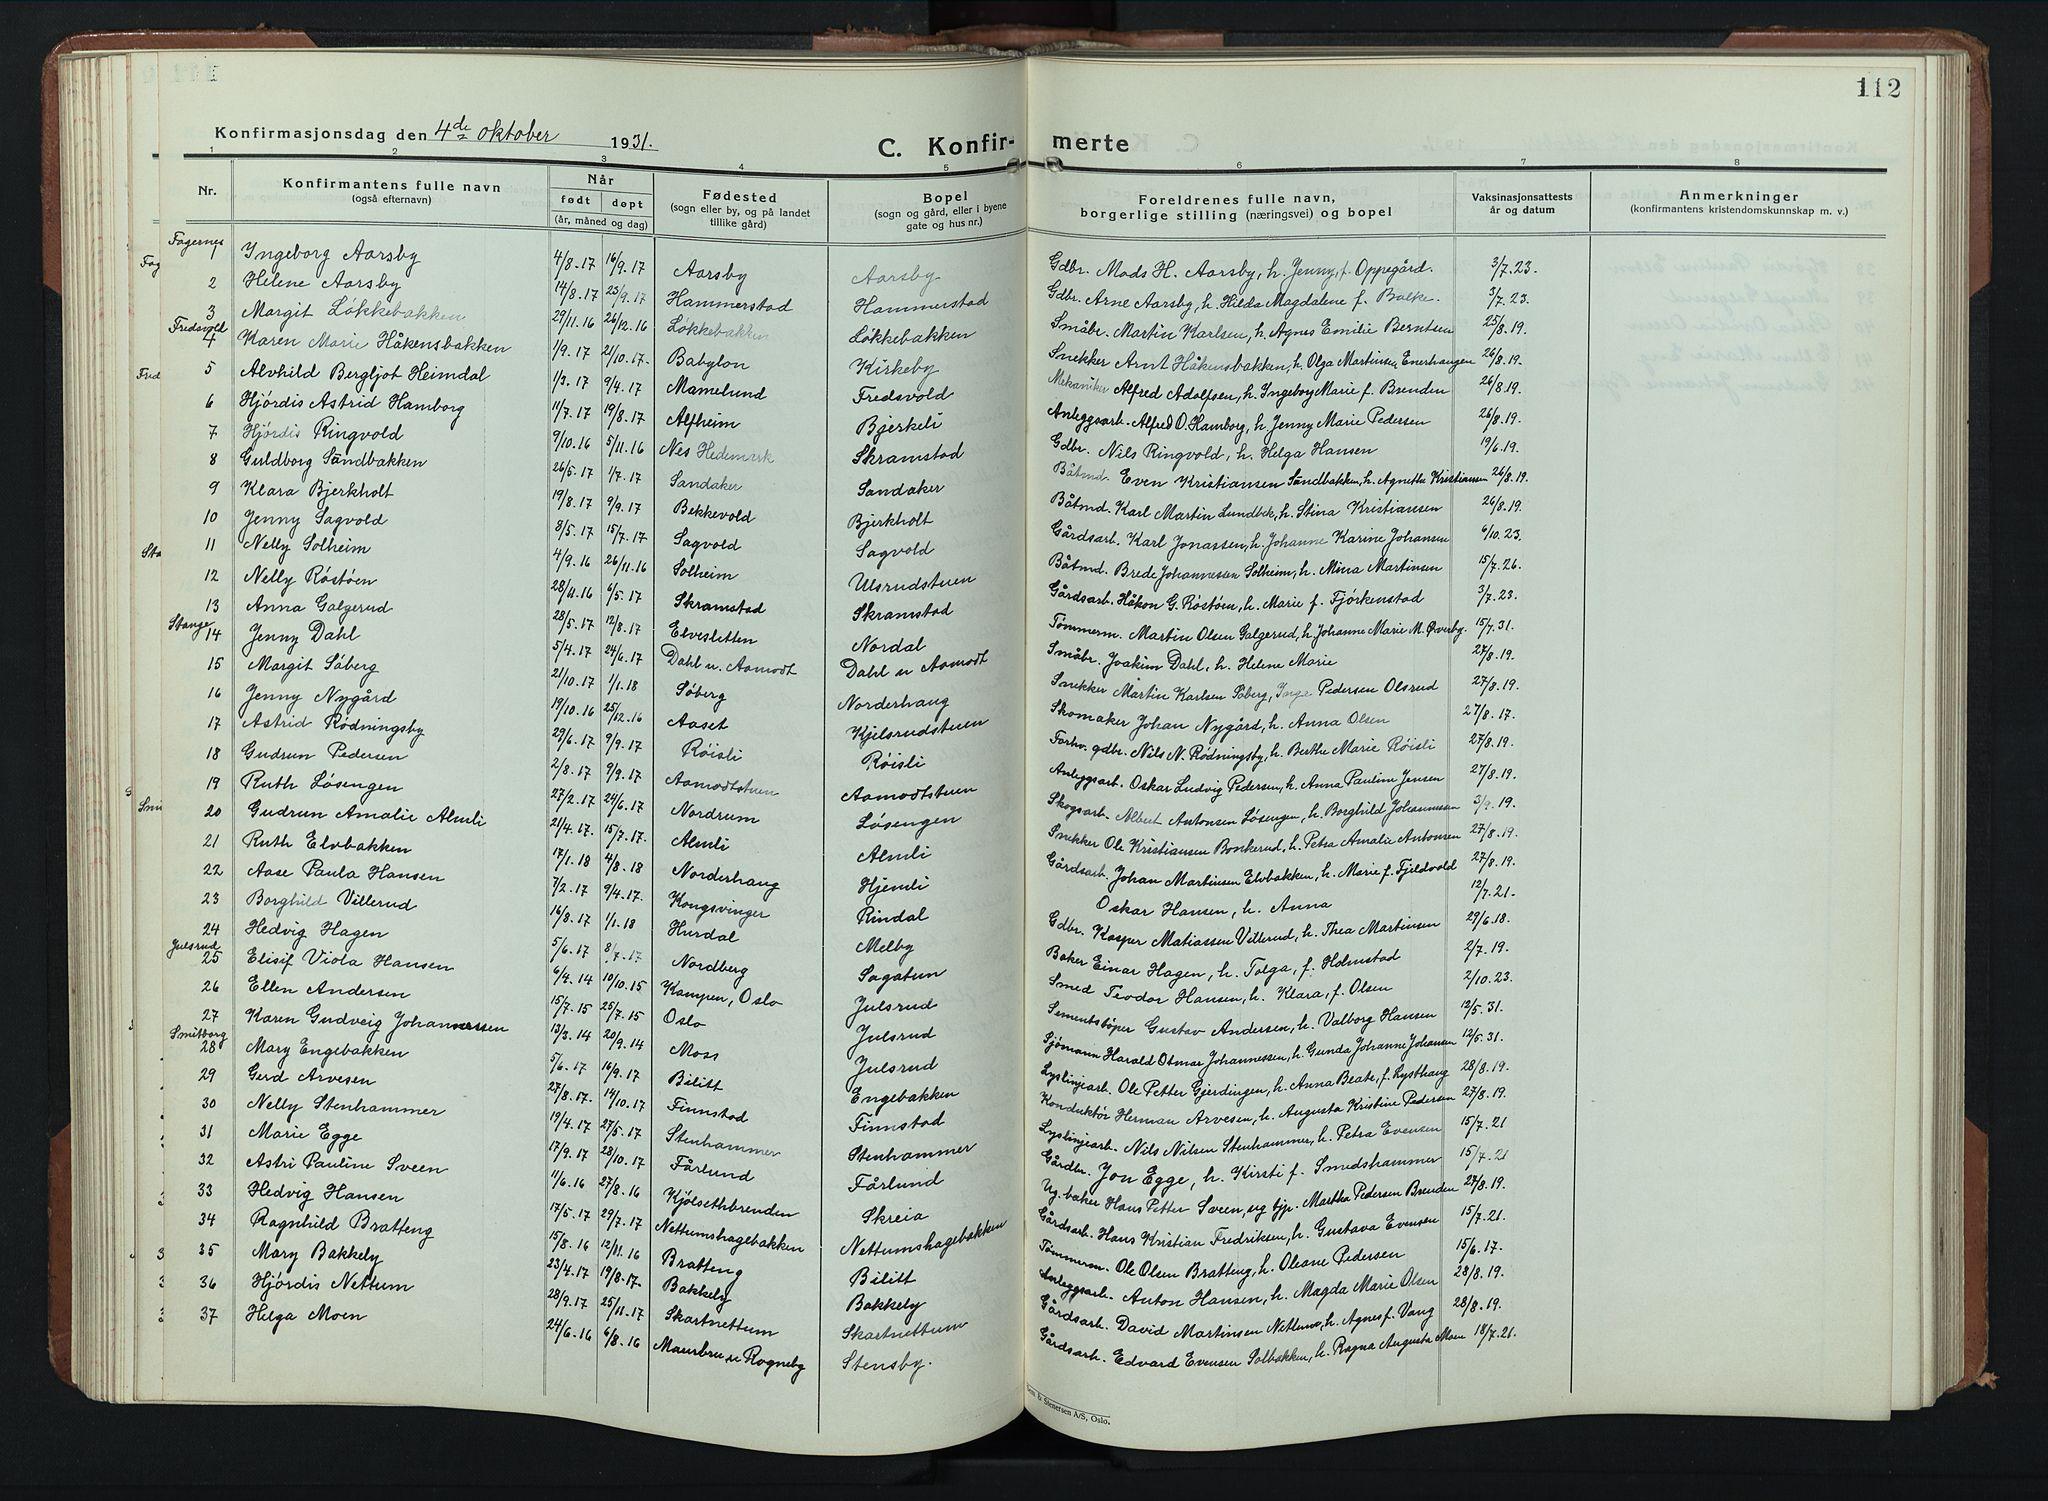 SAH, Balke prestekontor, Klokkerbok nr. 2, 1929-1951, s. 112